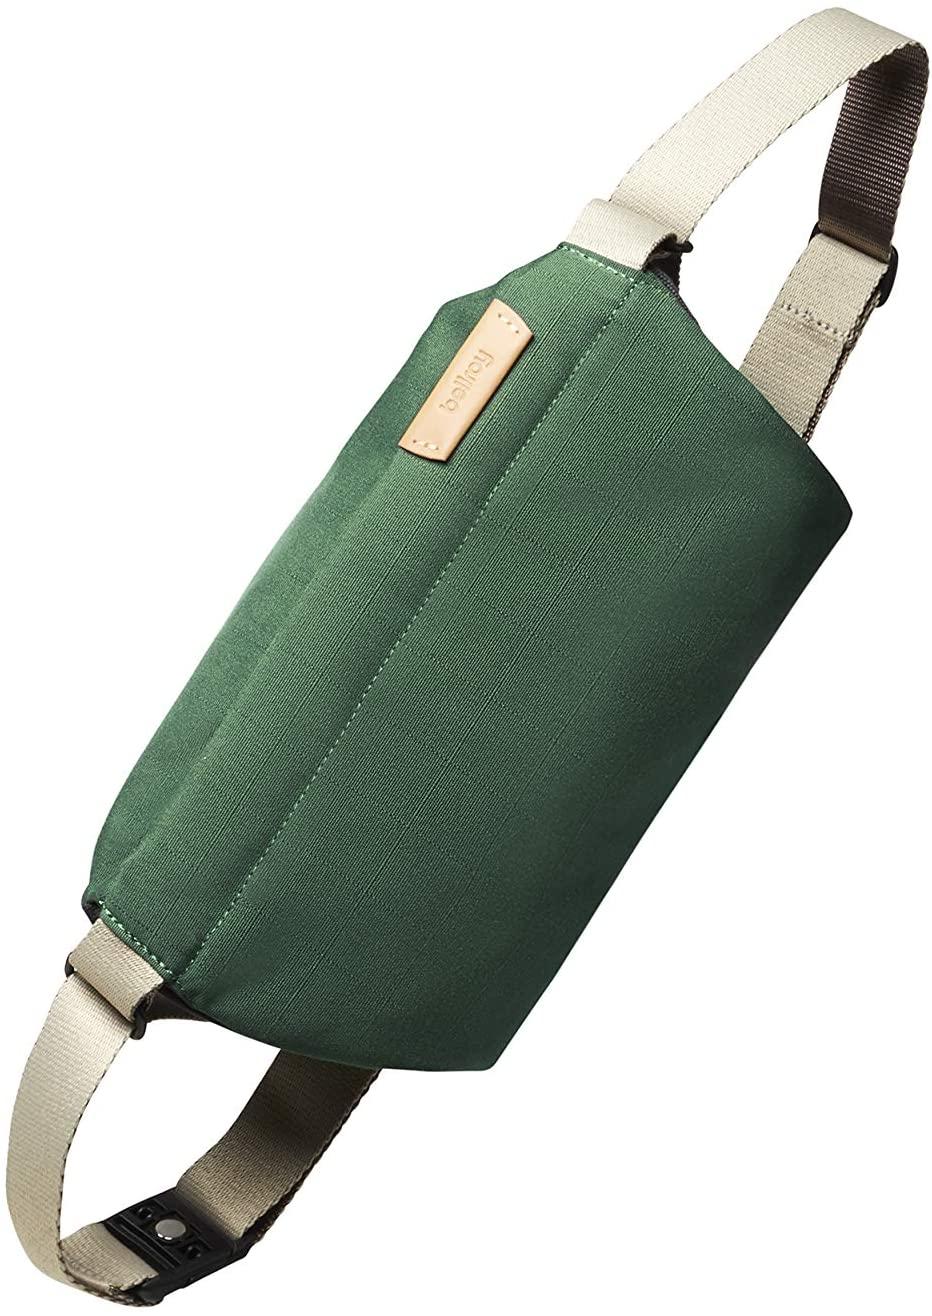 Bellroy Mini Sling Bag (Slim Crossbody Bag for Men & Women, Lightweight Water-Resistant Woven Materials, Multiple Organization Compartments) - Forest